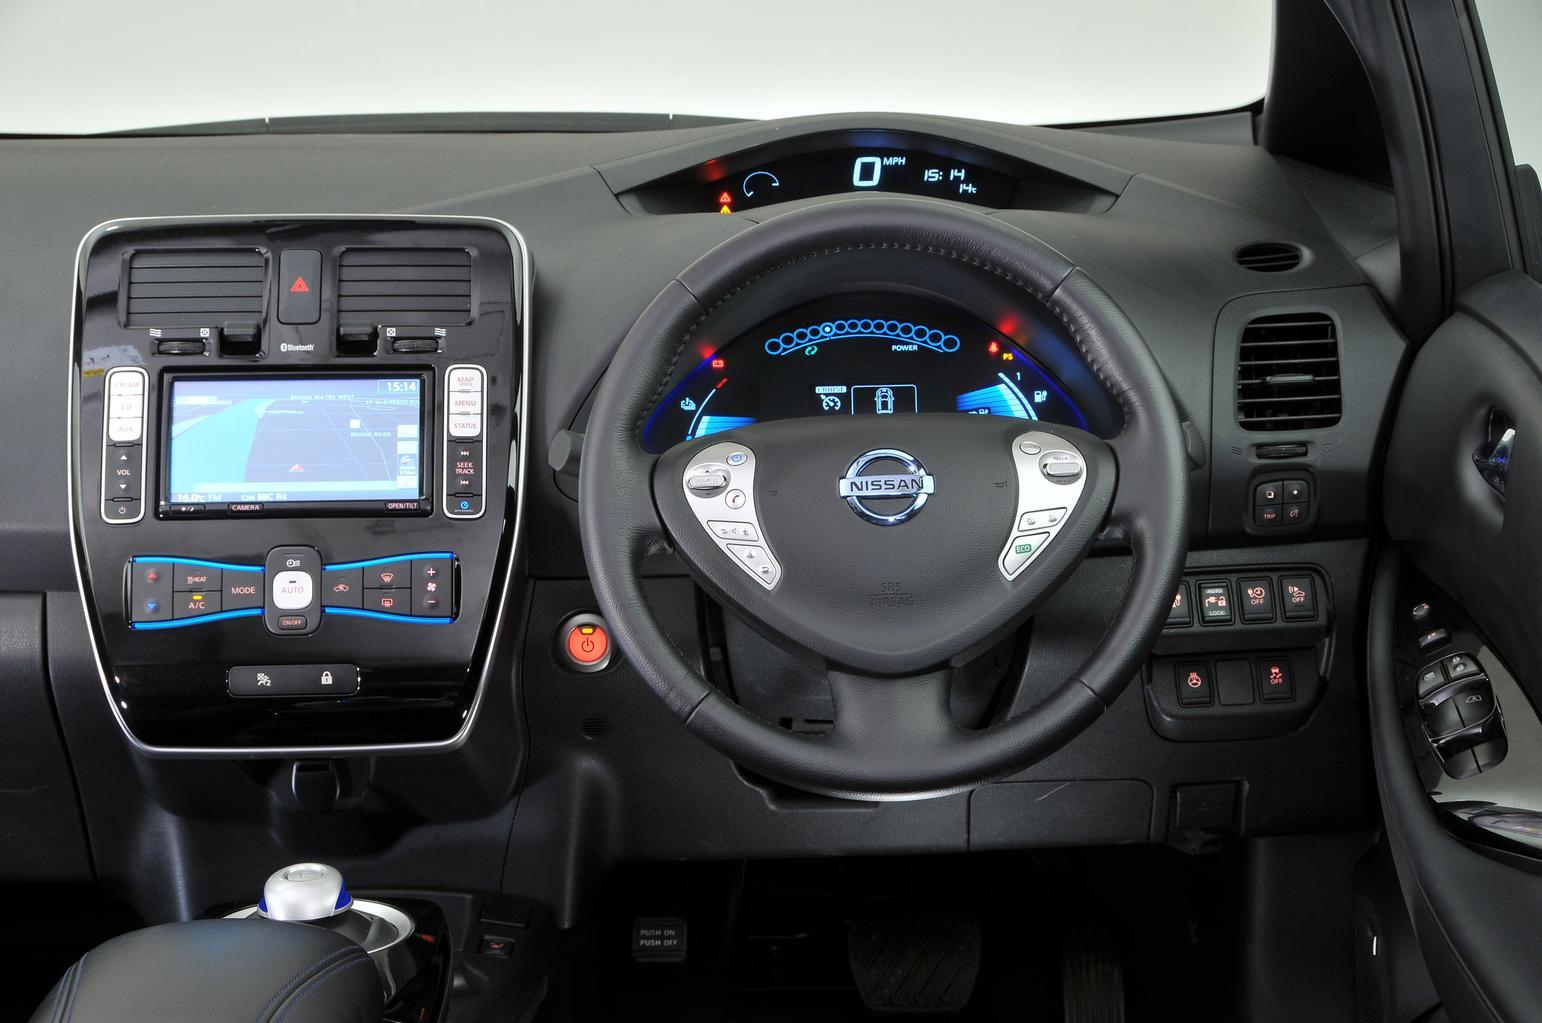 Nissan Leaf reviewed on video